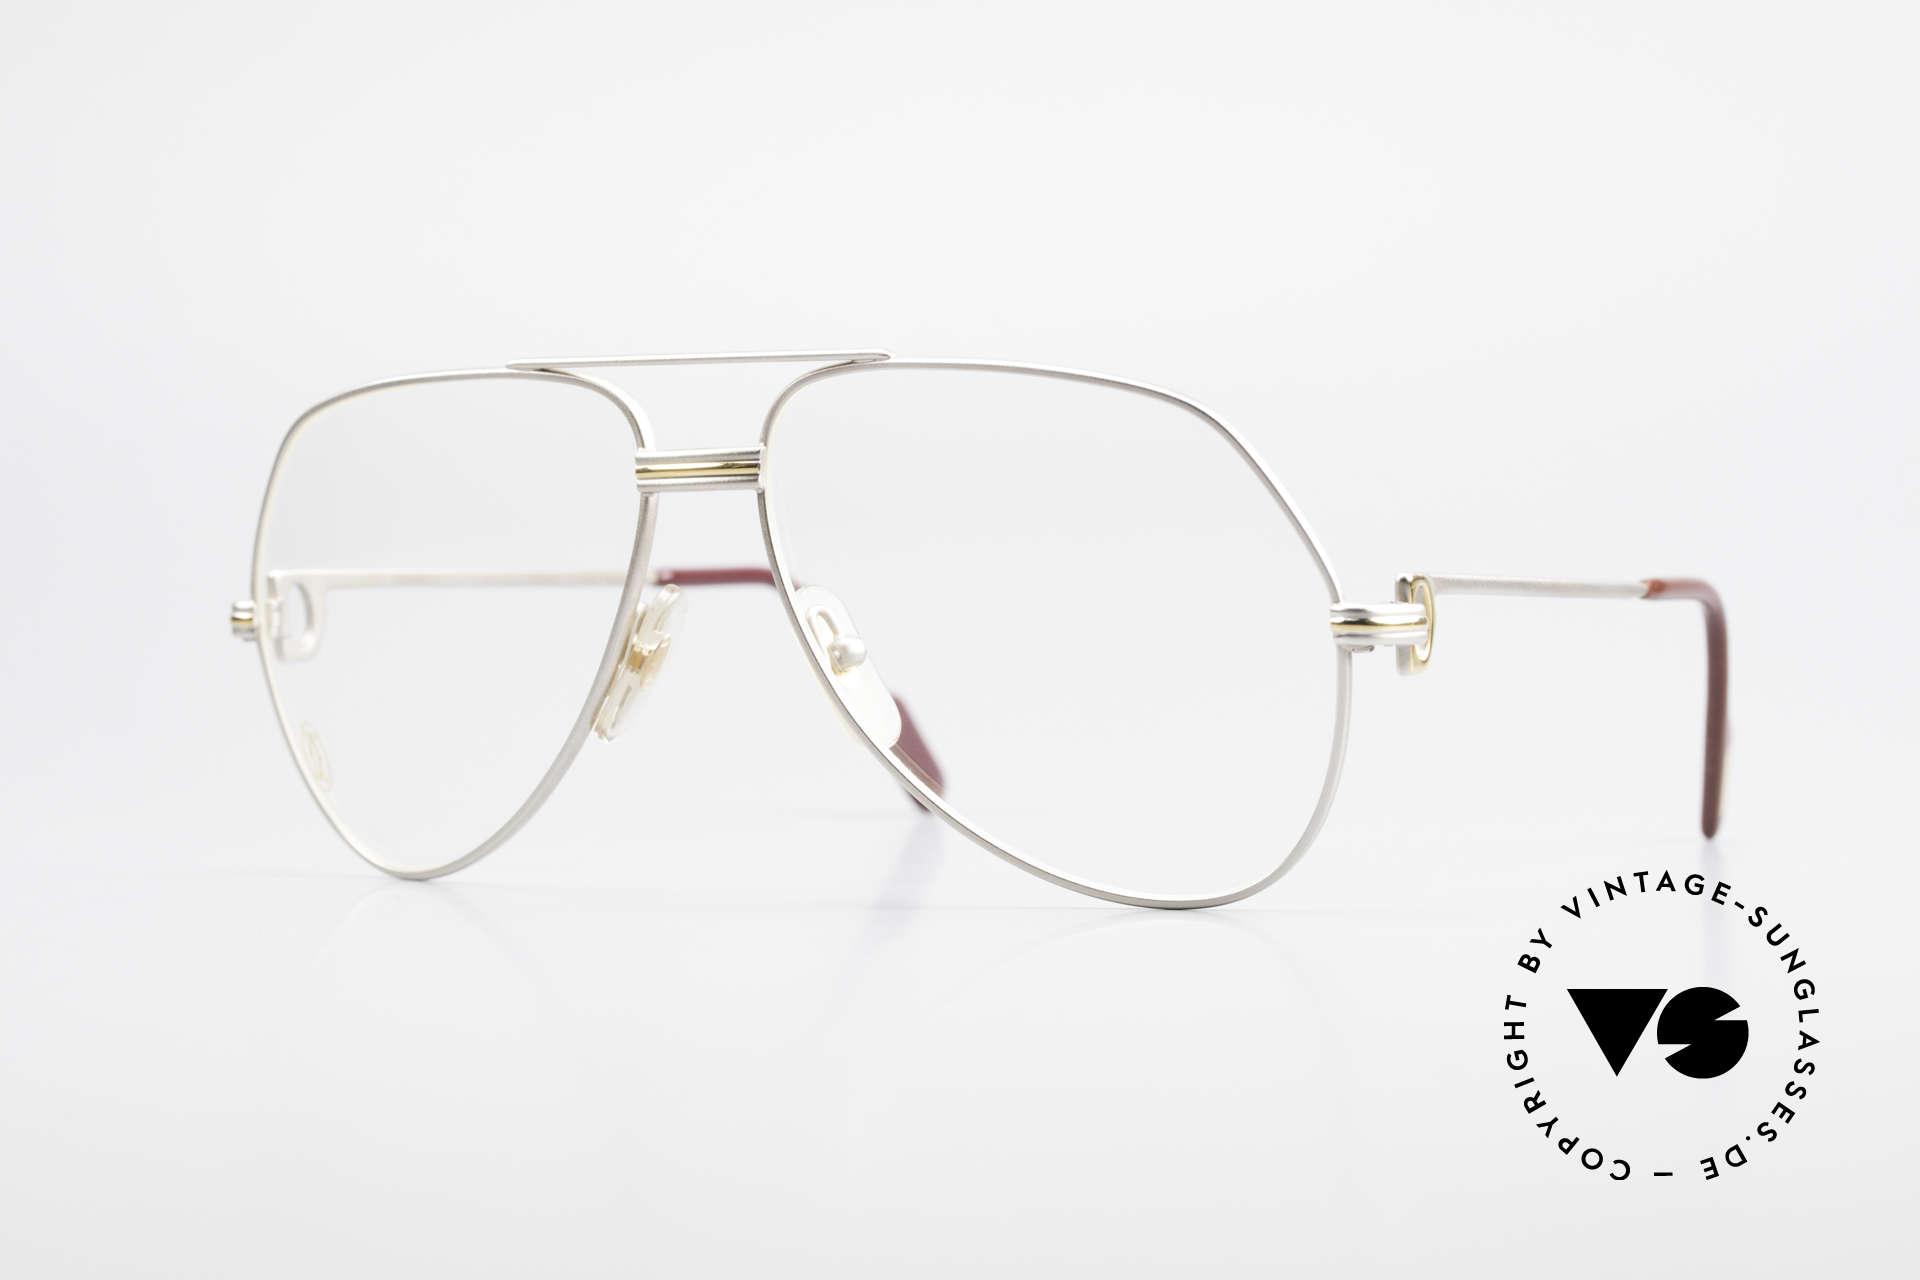 Cartier Vendome LC - M Precious Palladium Finish, Vendome = the most famous eyewear design by CARTIER, Made for Men